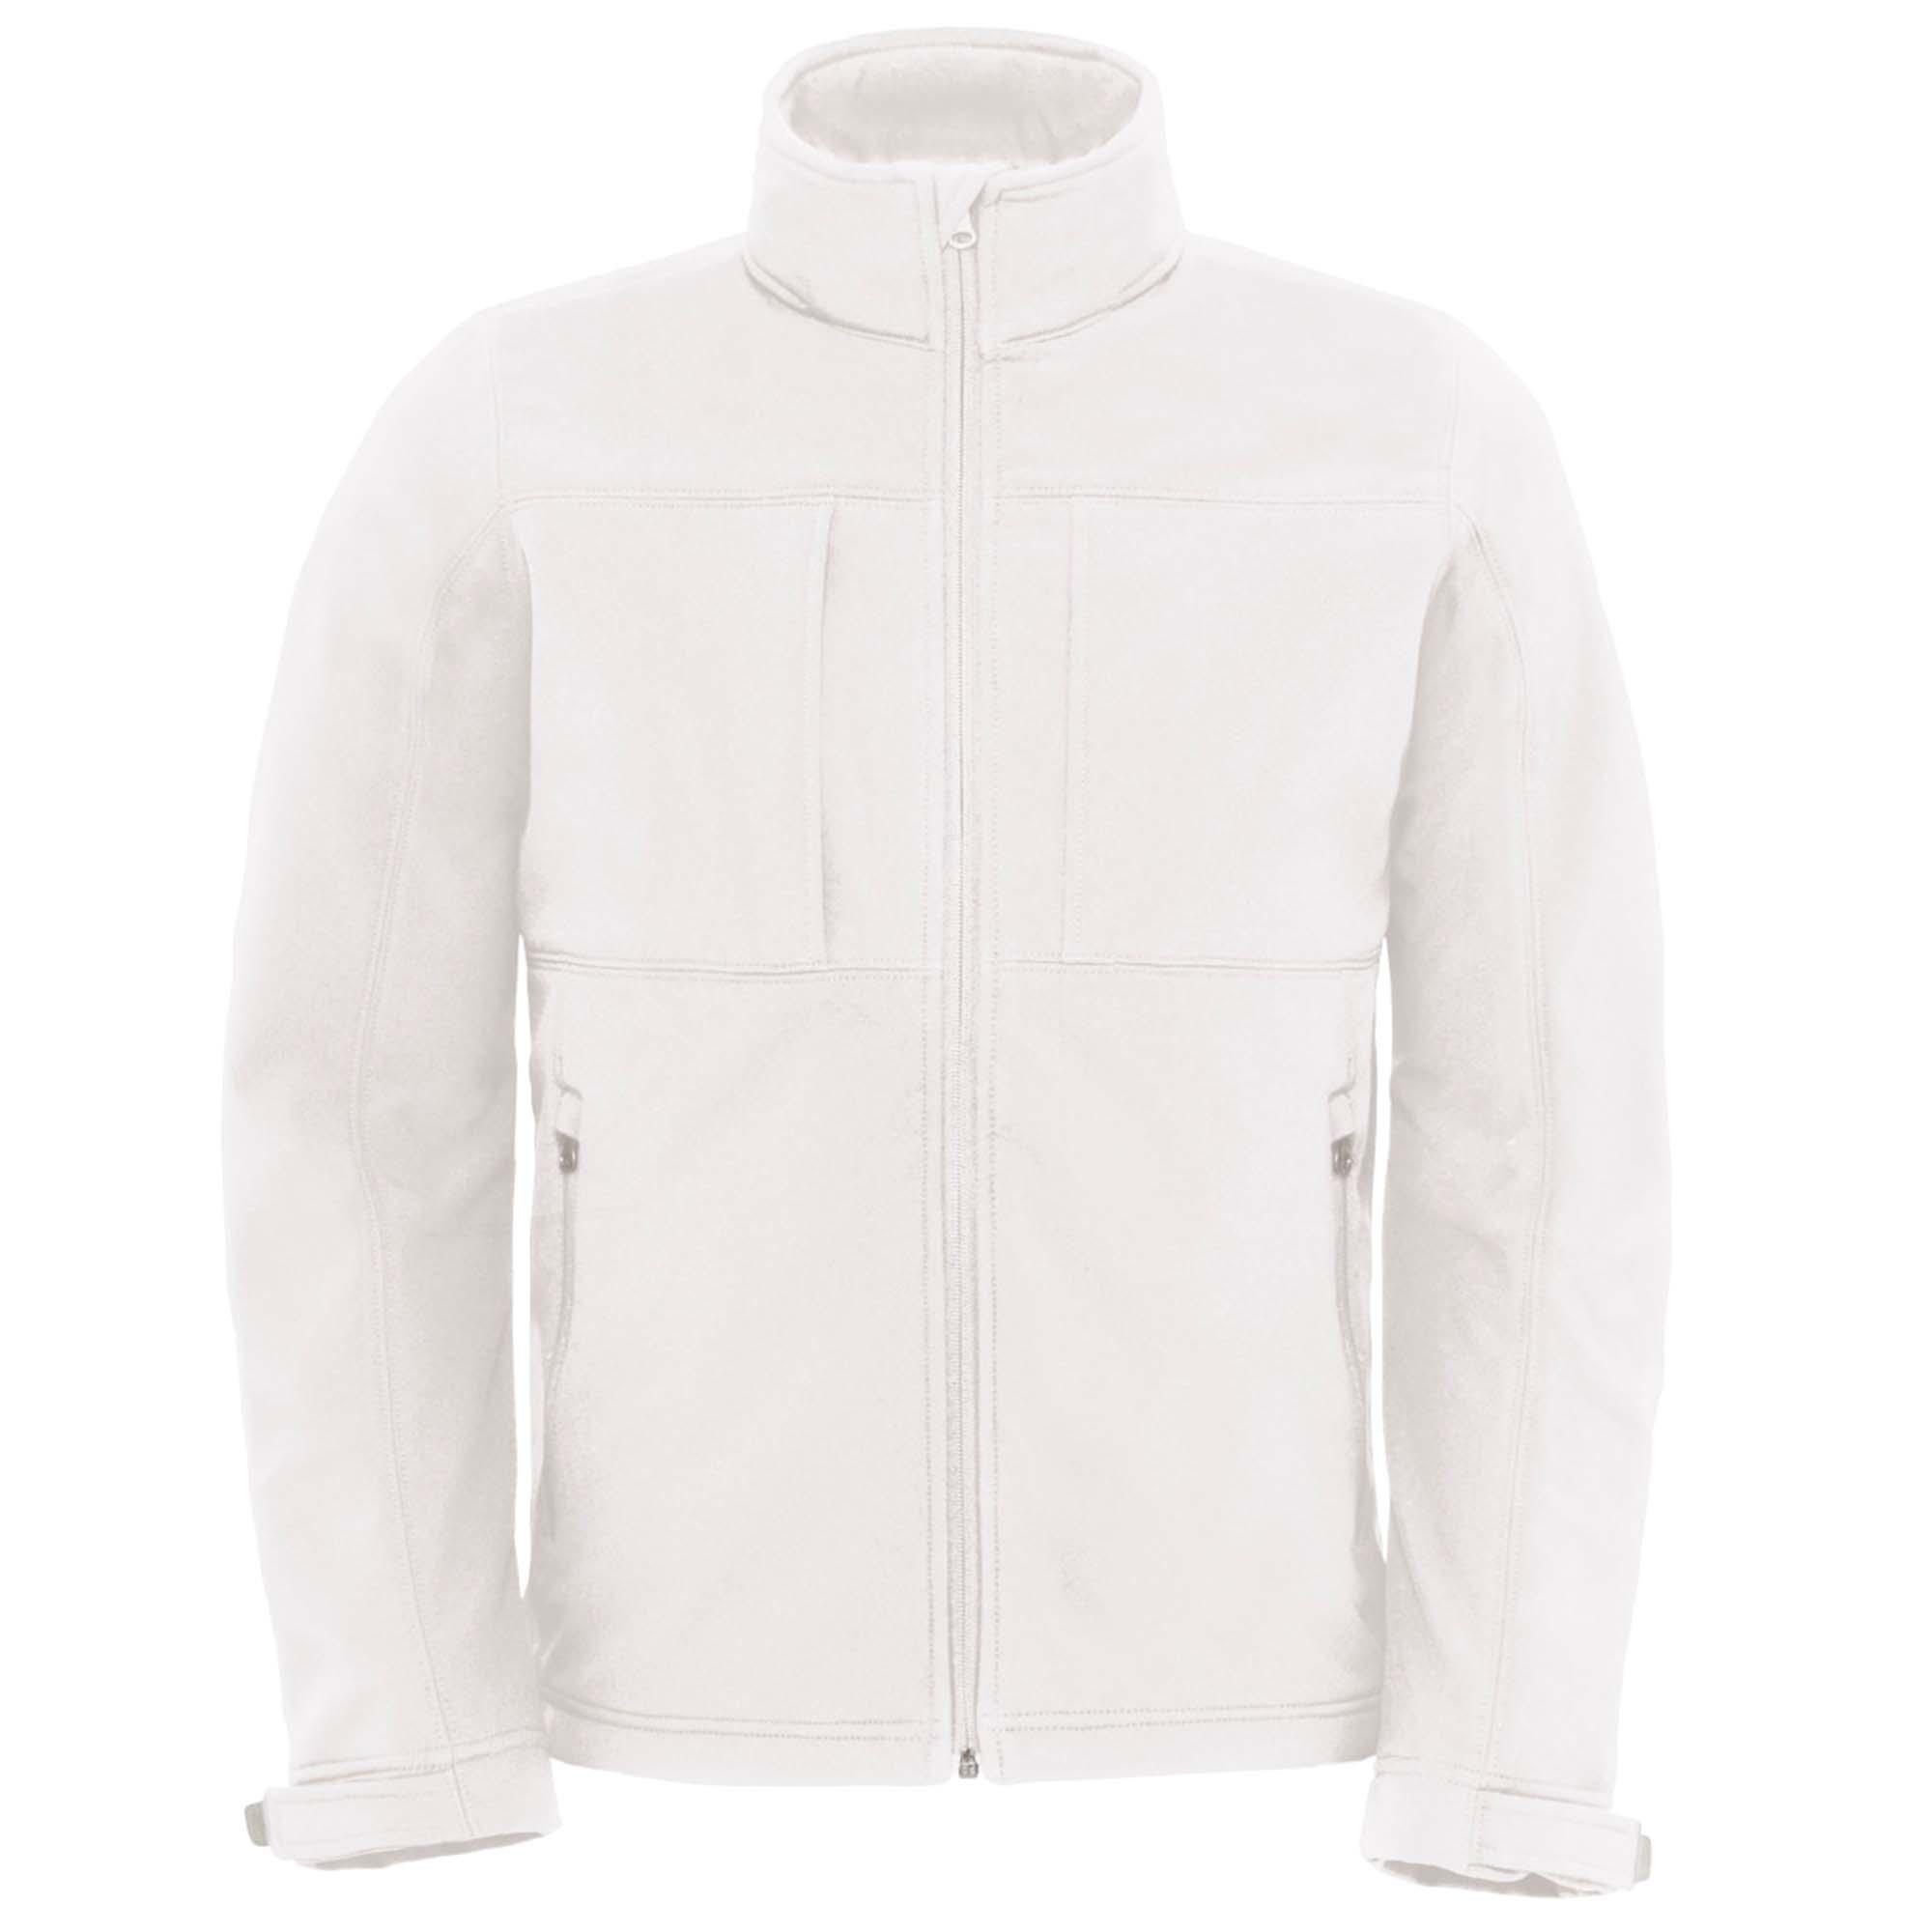 B&C Mens Hooded Softshell Breathable, Waterproof & Windproof Jacket (Fleece Lining) (3XL) (Dark Grey)